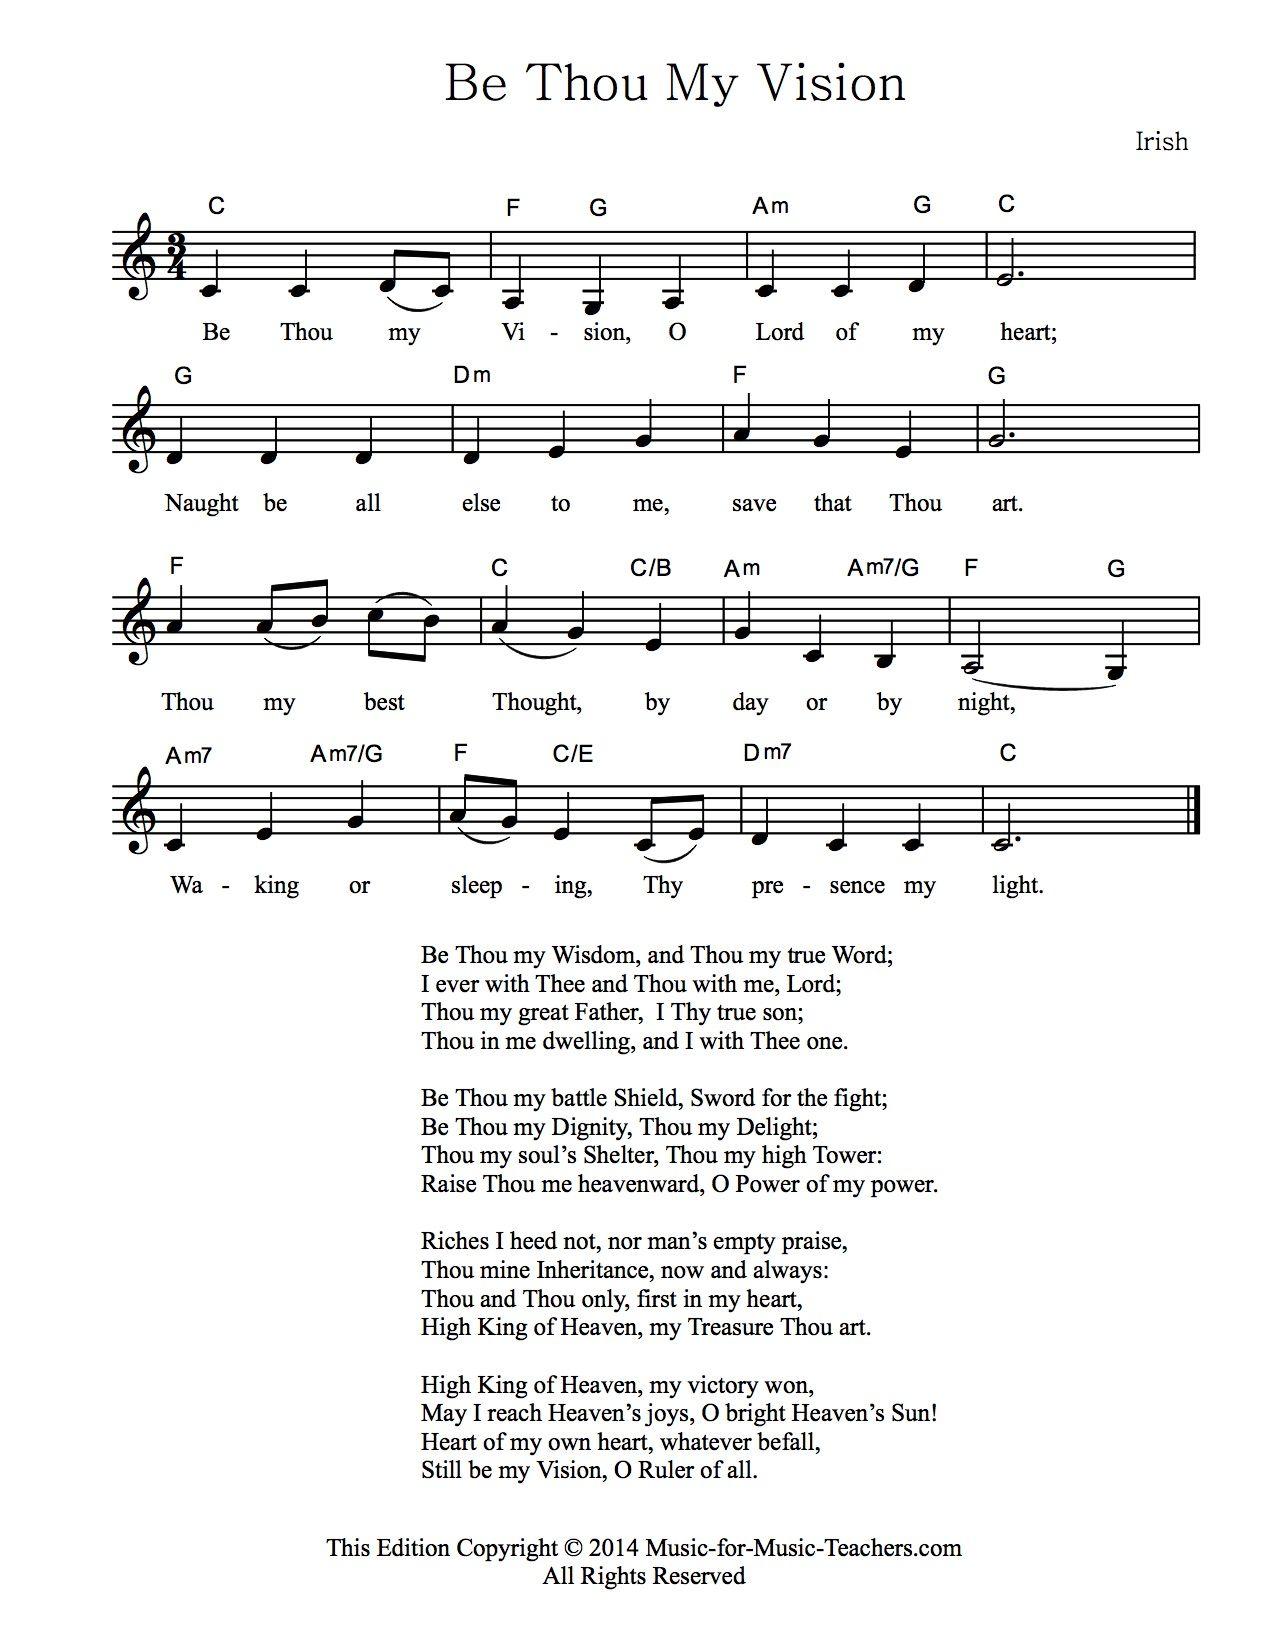 Be Thou My Vision lyrics   Be Thou my sheet music   Free